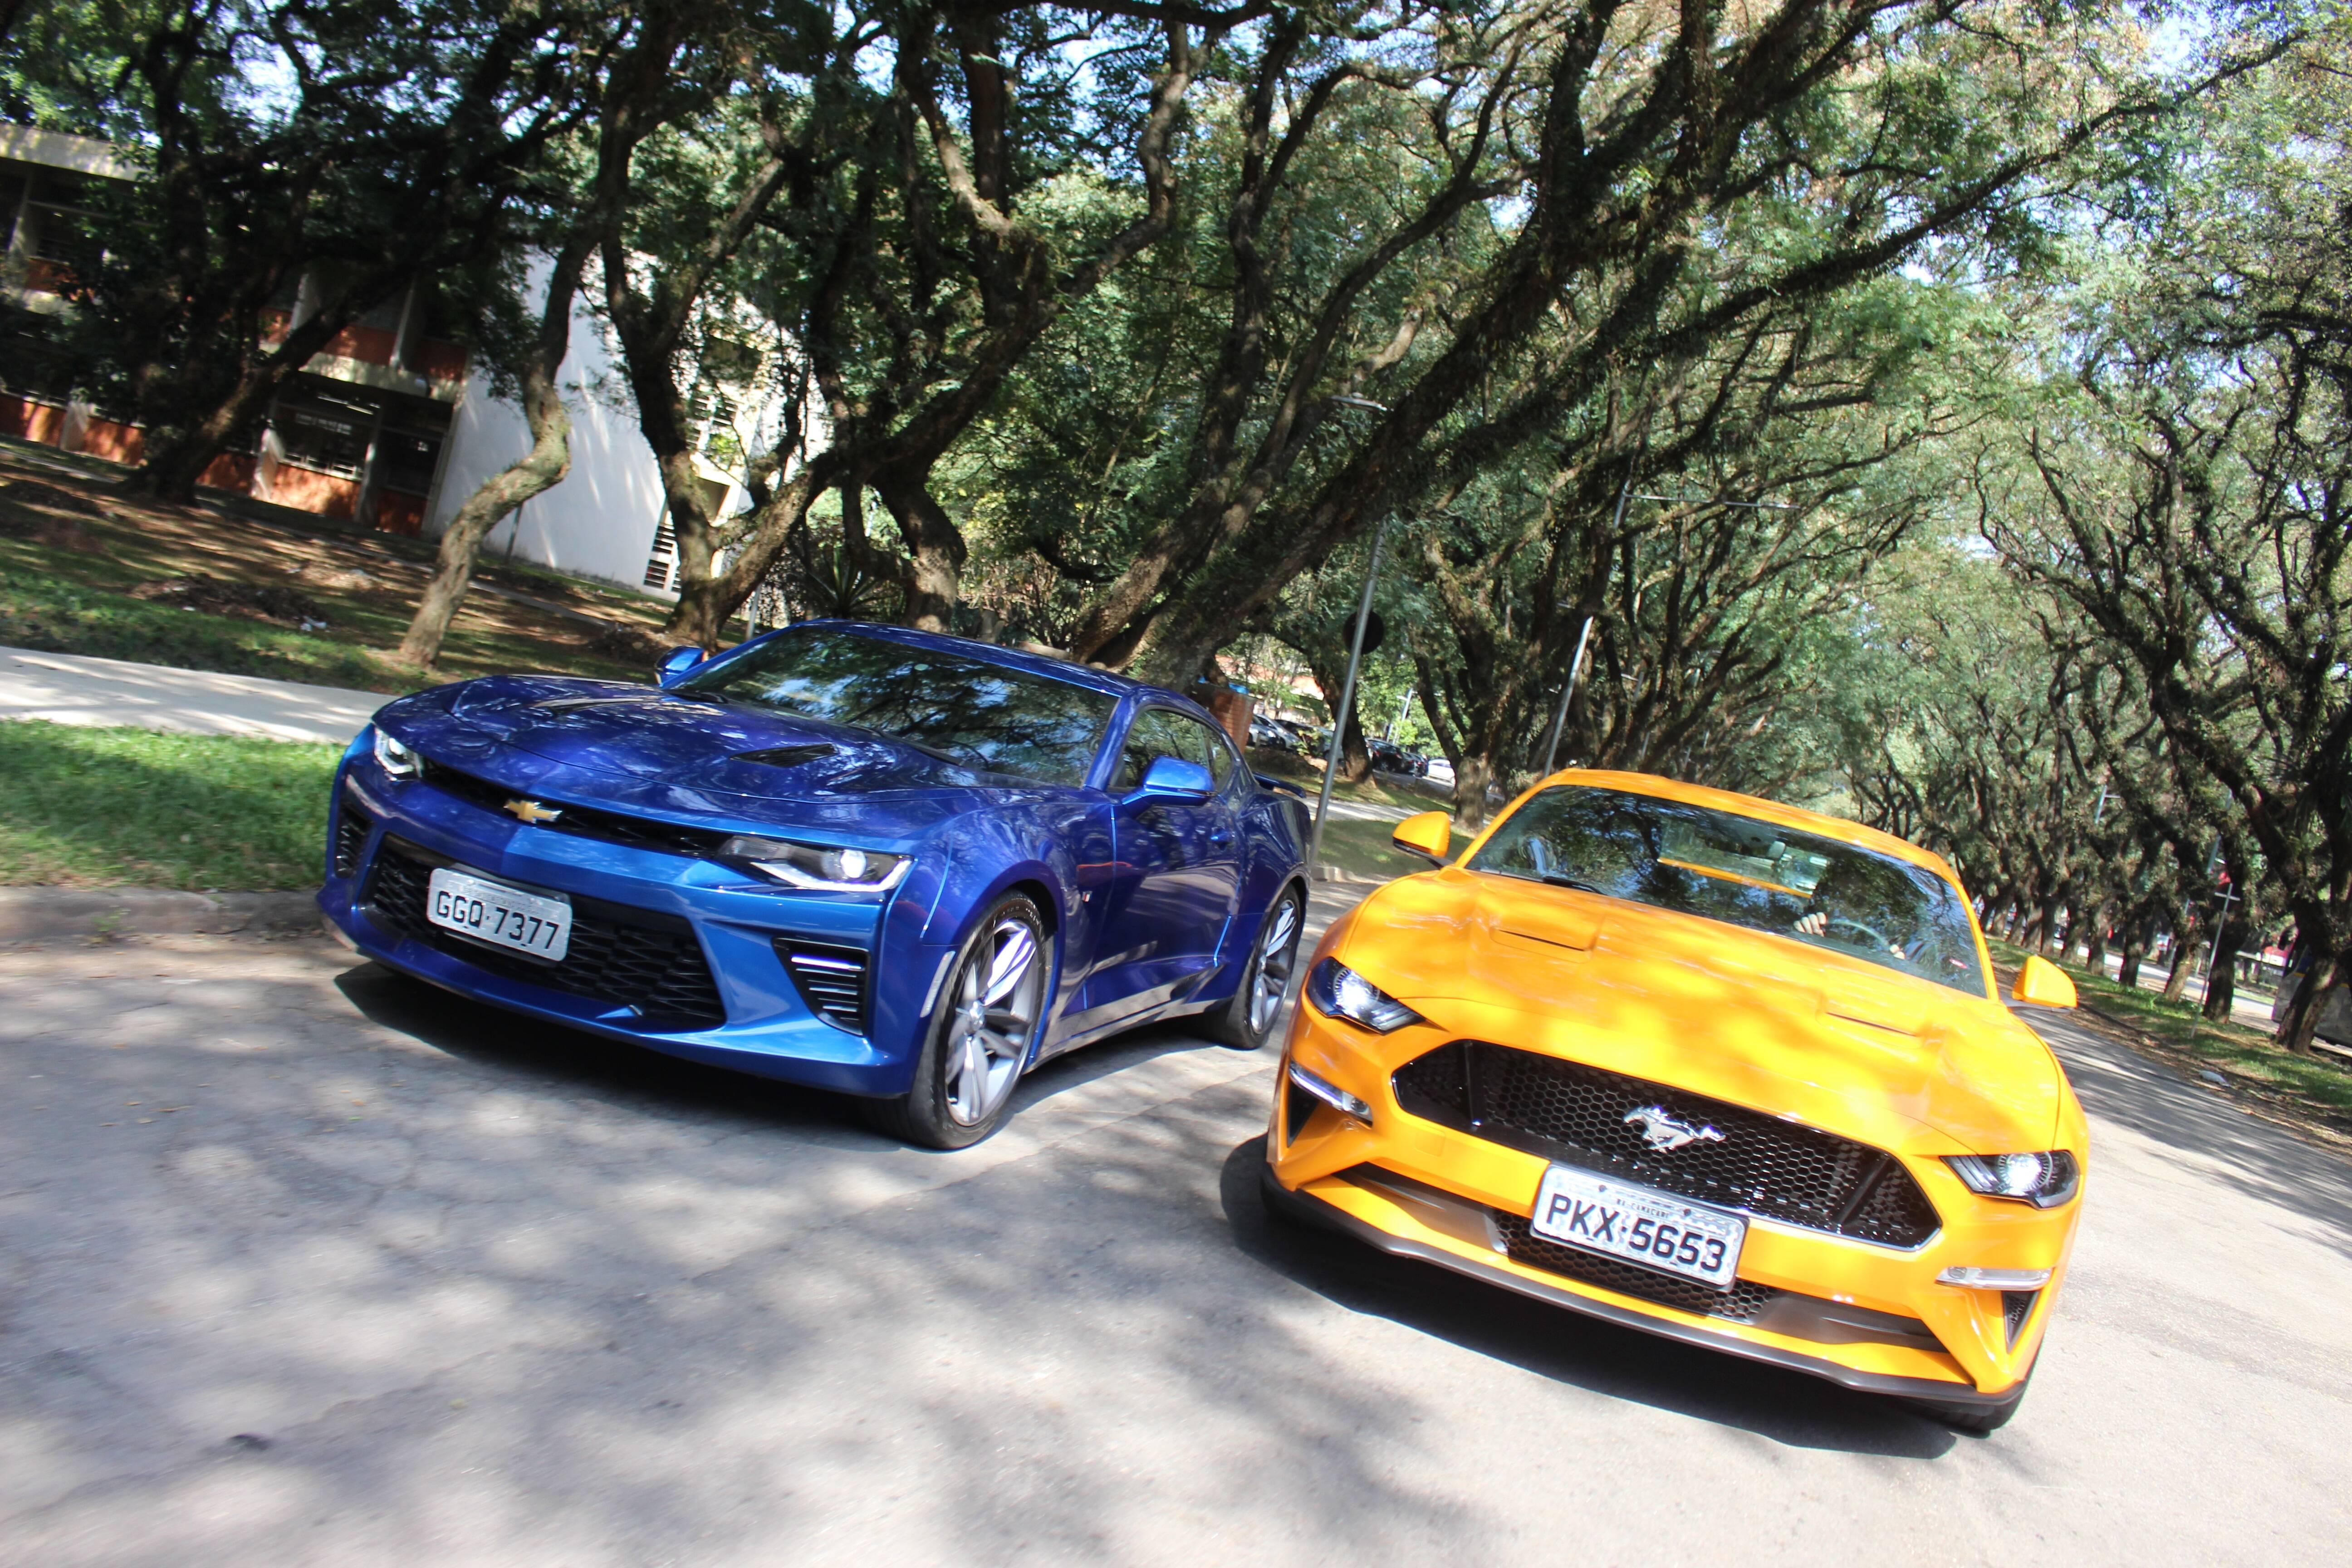 Chevrolet Camaro e Ford Mustang. Foto: Caue Lira/iG